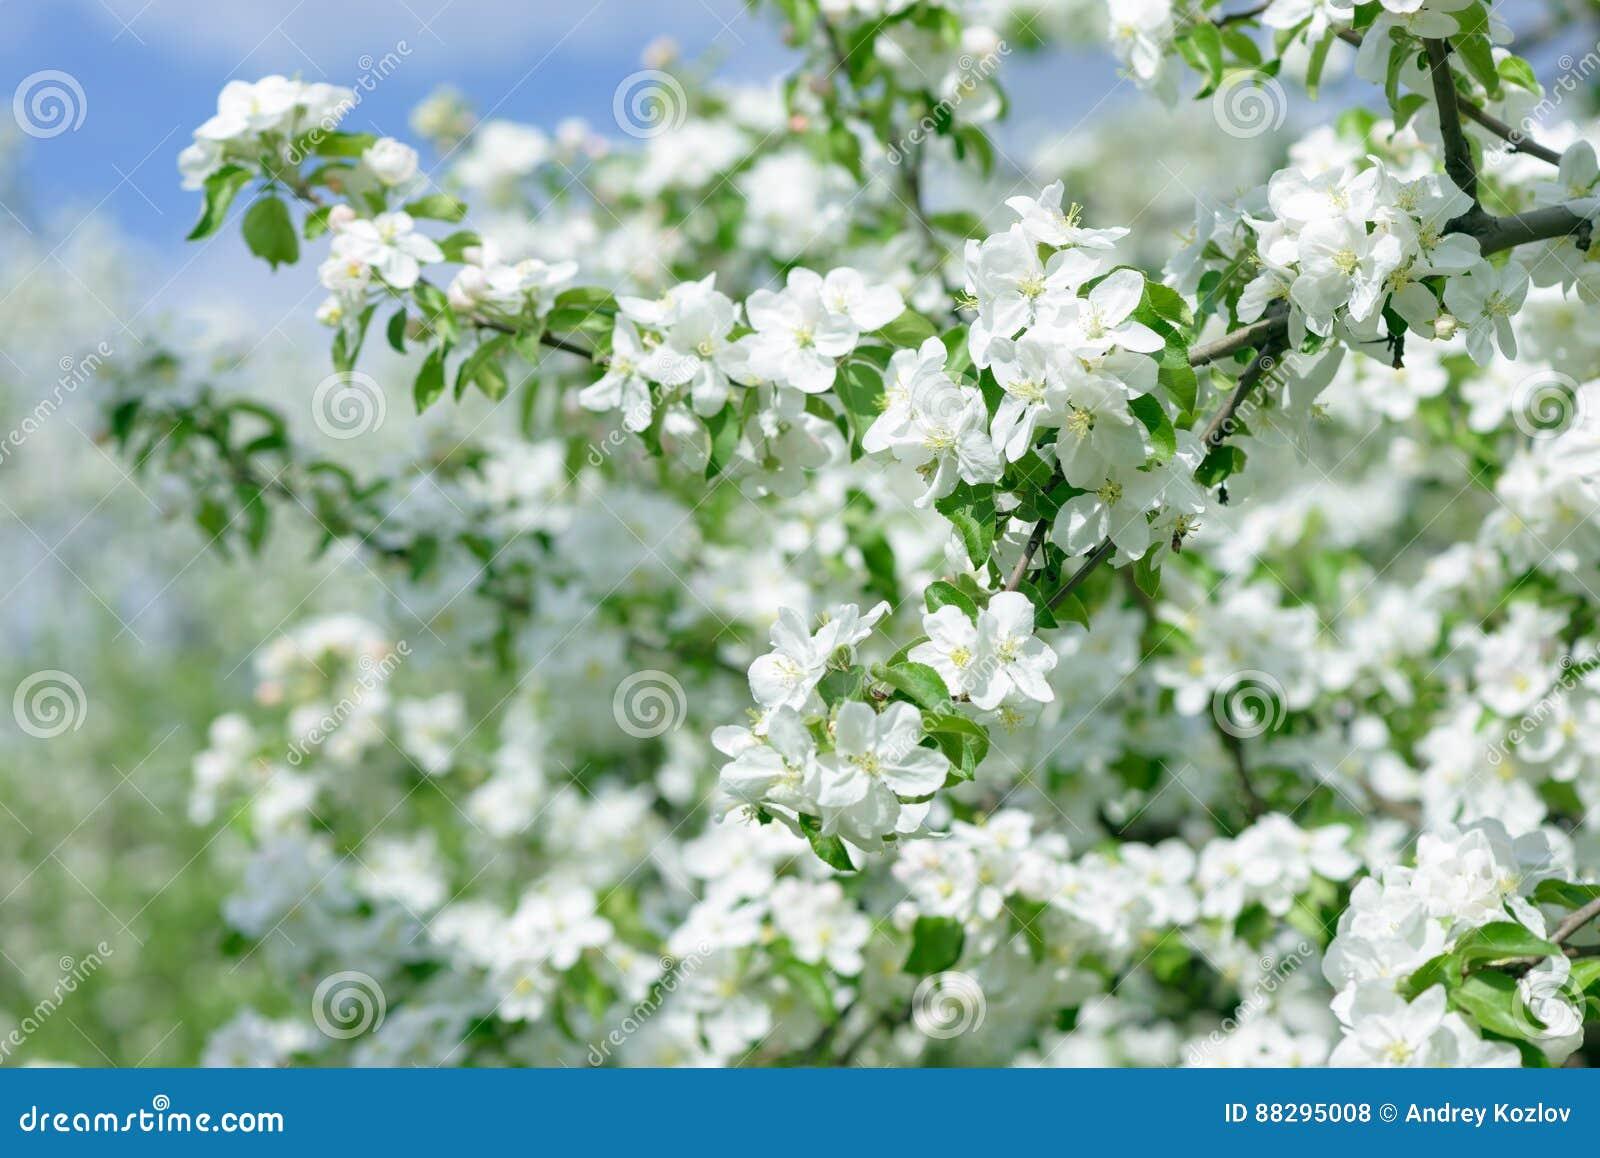 White apple flowers beautiful flowering apple trees background download white apple flowers beautiful flowering apple trees background with blooming flowers in spring mightylinksfo